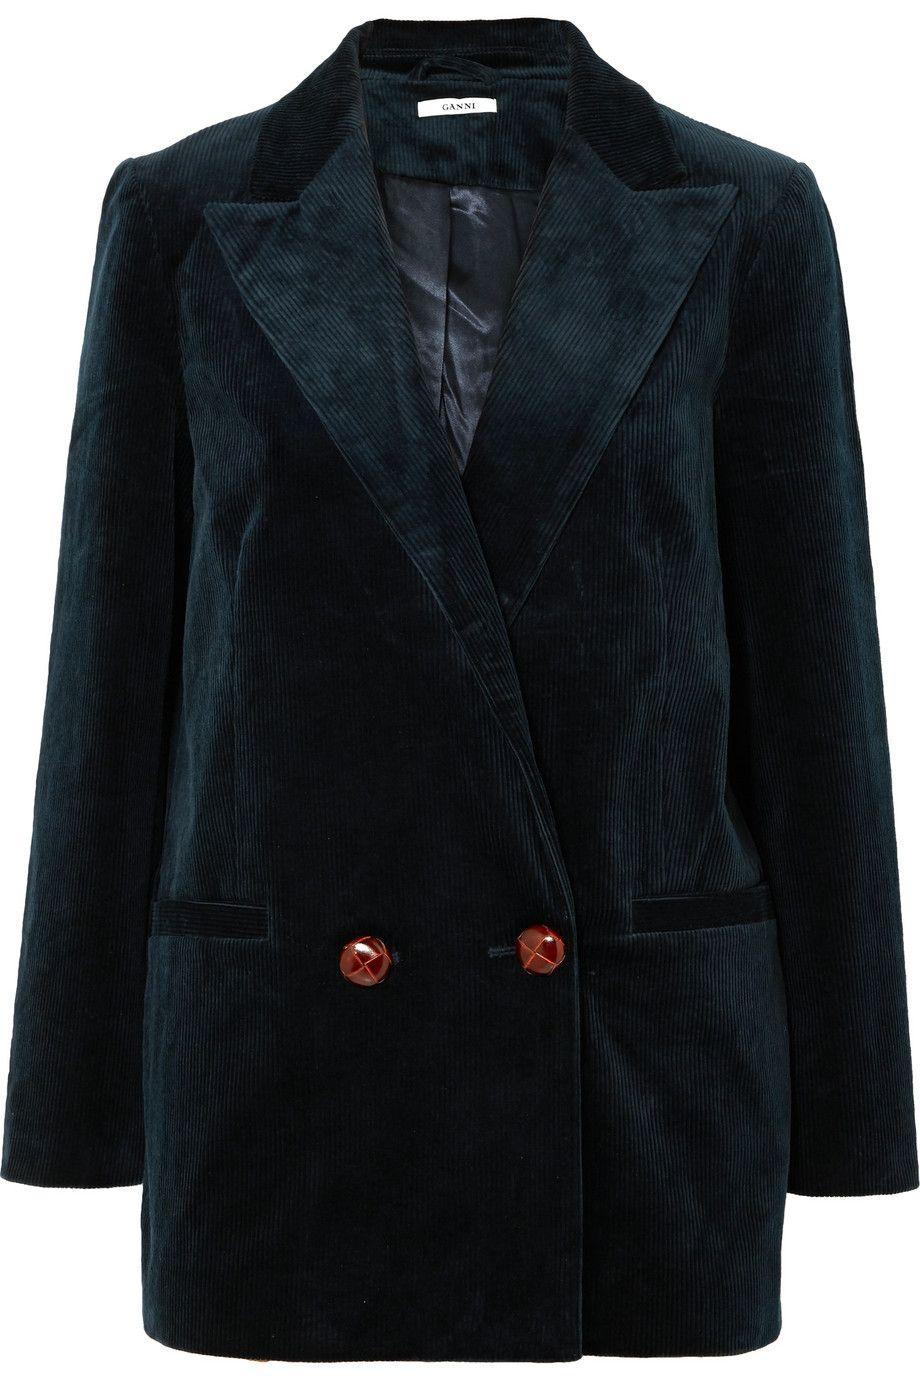 #PopbelaOOTD: Blazer Kasual untuk Sehari-hari